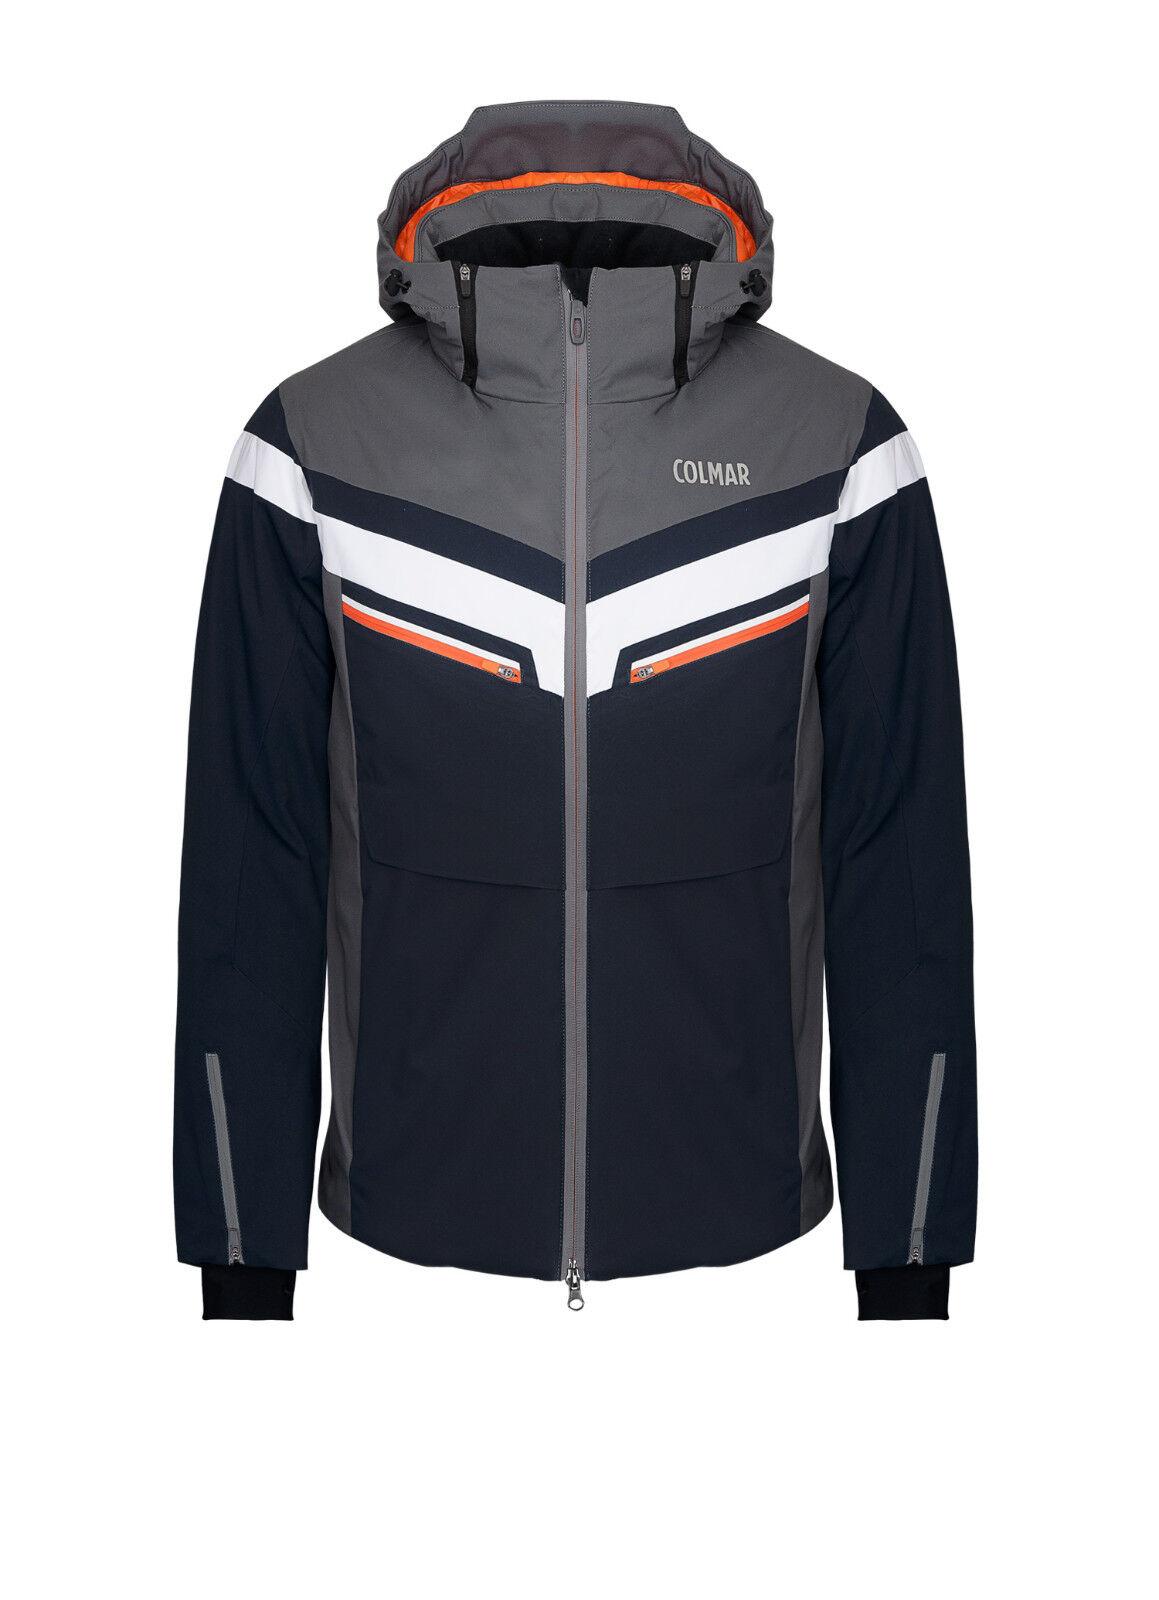 Giacca da sci uomo linea Alpine COLMAR mod. 1349 stagione 2017/2018